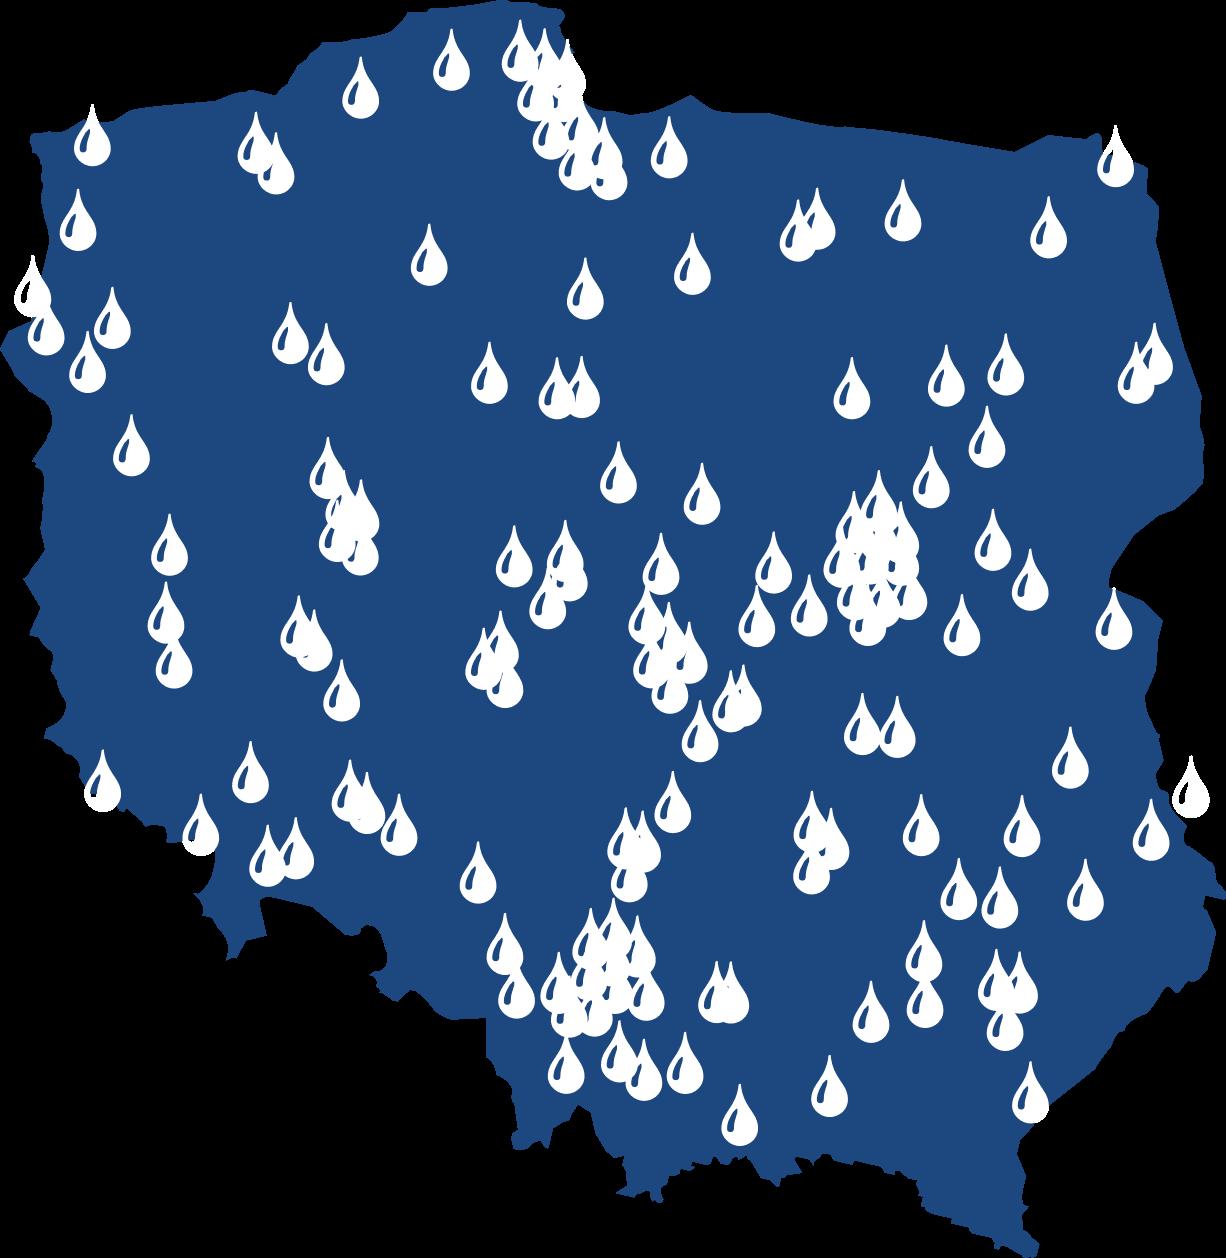 https://www.multiwash.pl/wp-content/uploads/2020/04/mapa-polski-1.png